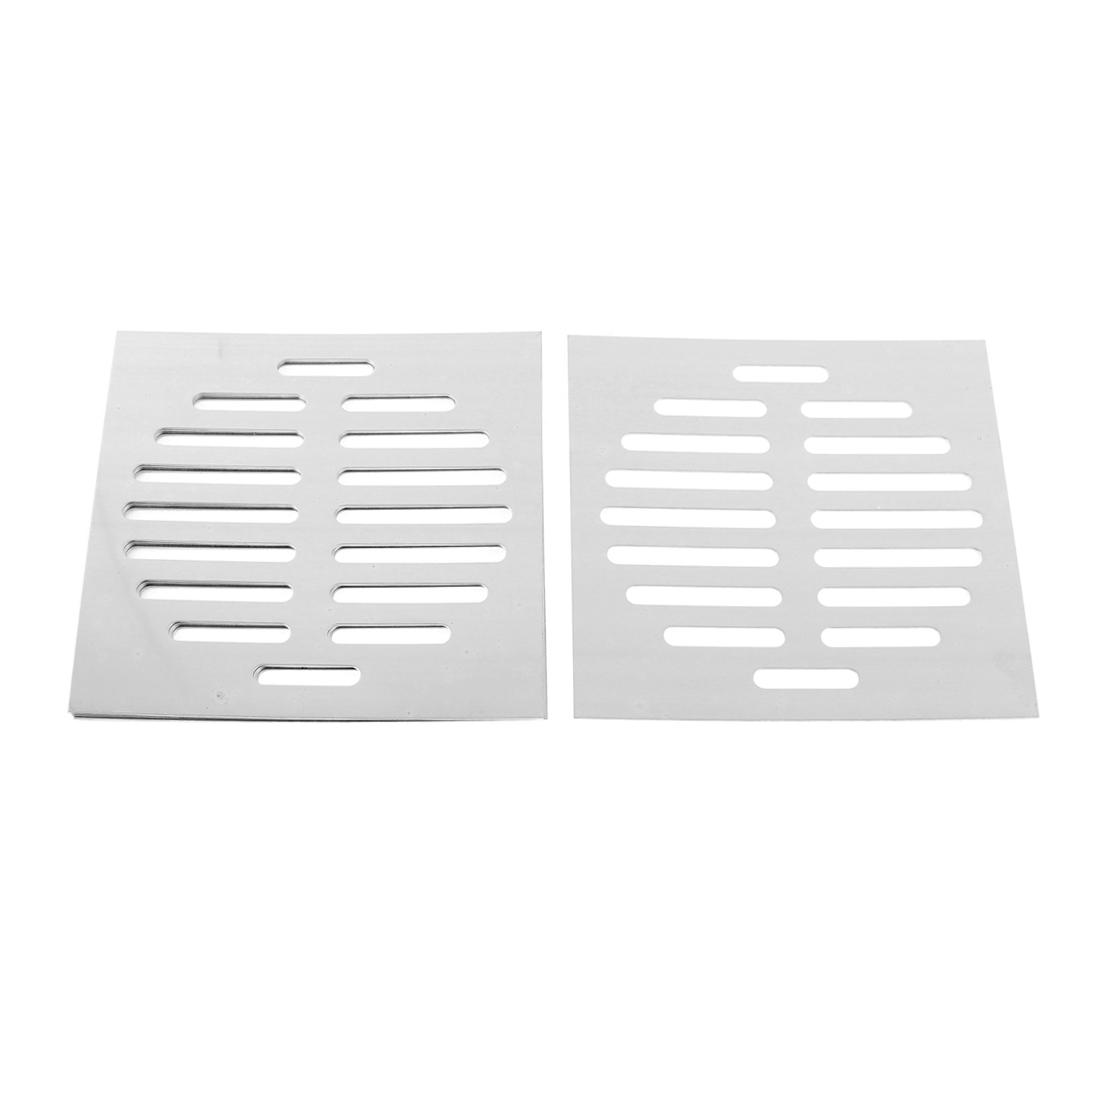 "Stainless Steel Kitchen Bathroom Square Floor Drain Cover 6"" 15cm 5pcs"